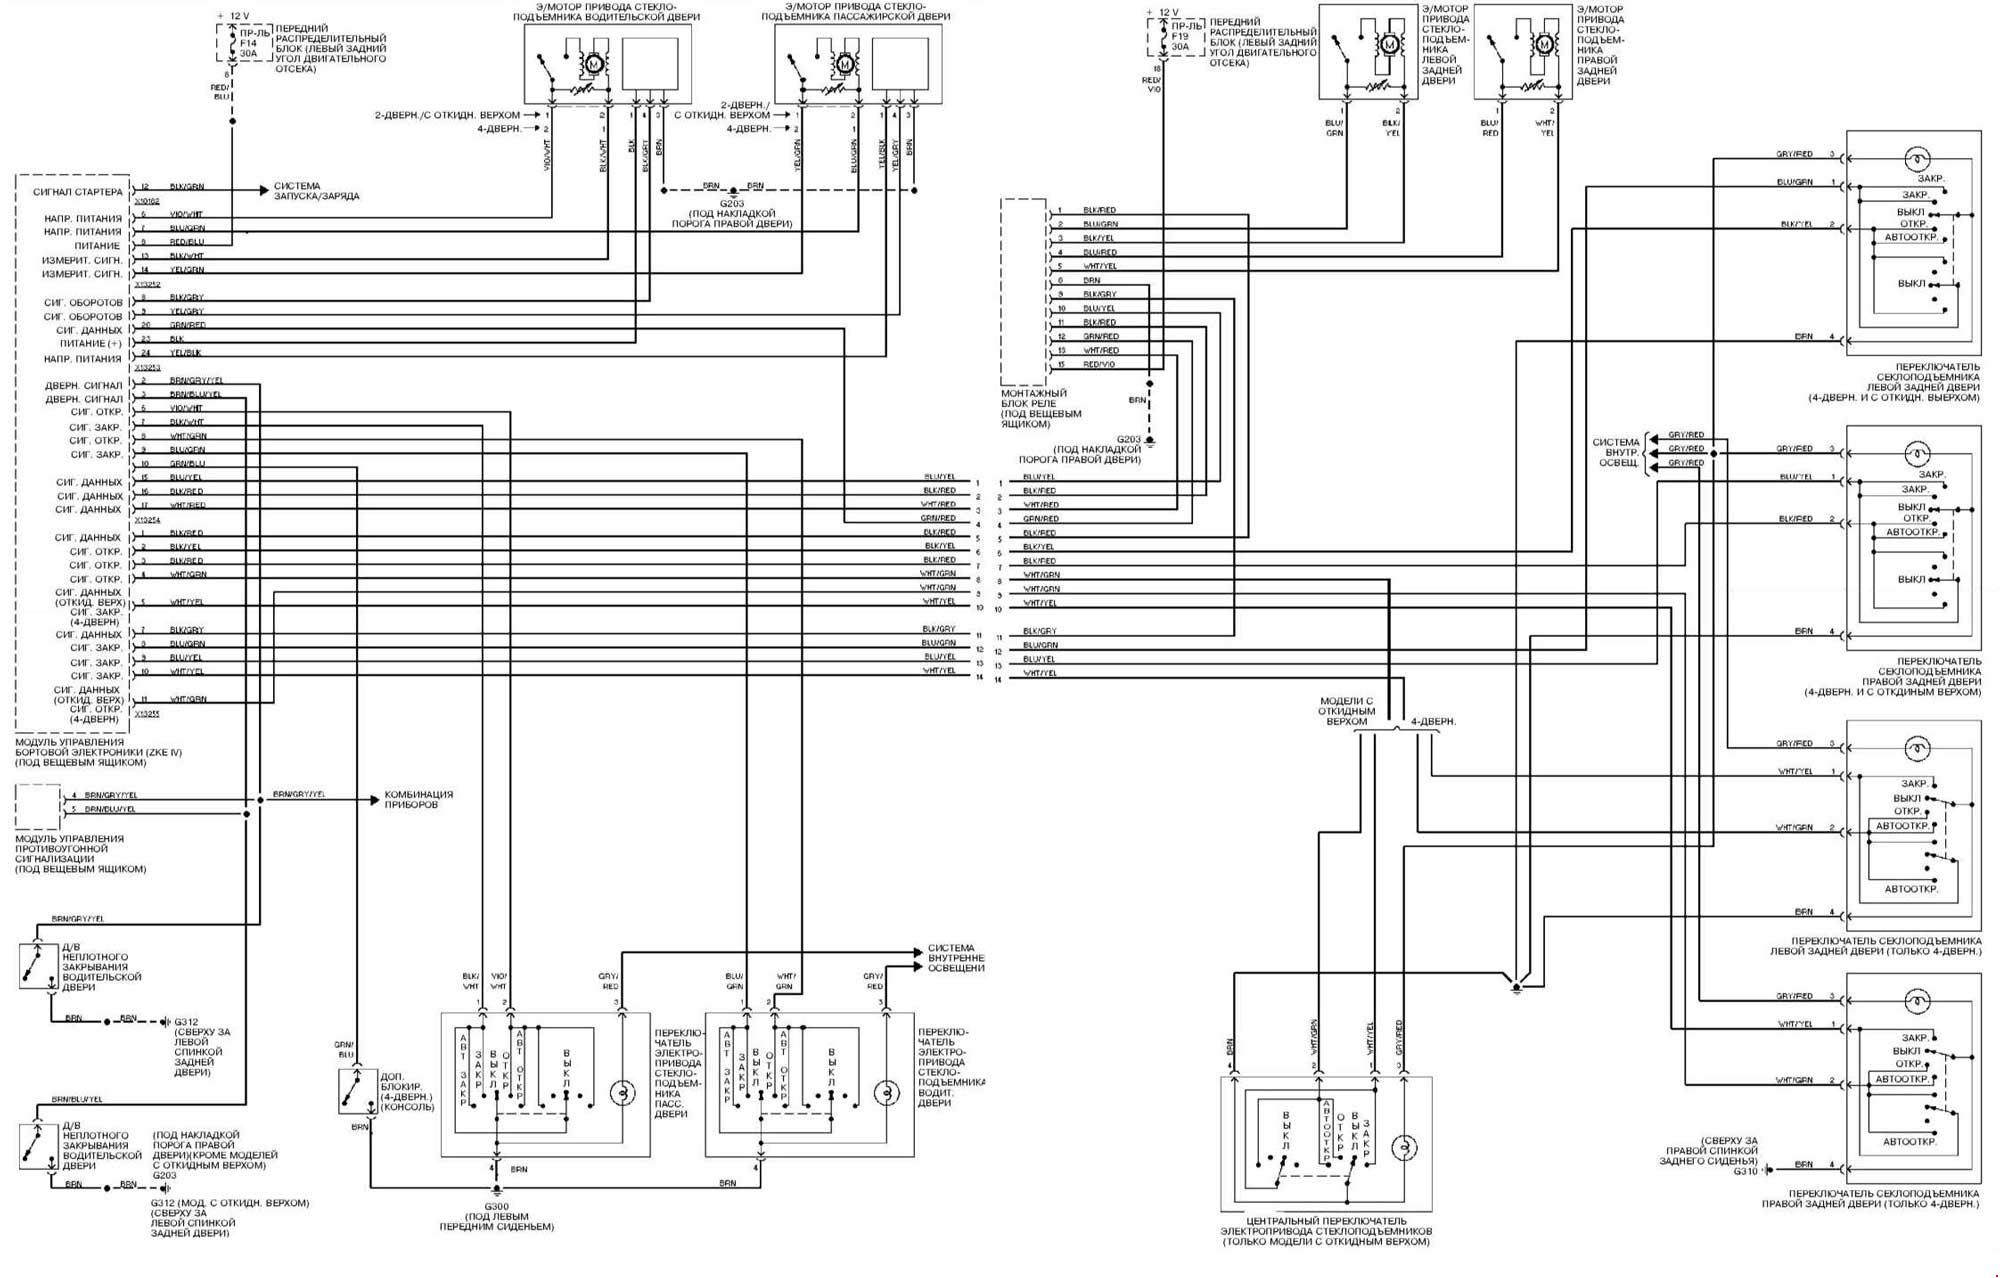 BMW 3 E46 EWD - Free PDF's | Bmw E46 Wiring Diagrams |  | BMW Service Documentation & Wiring Diagram